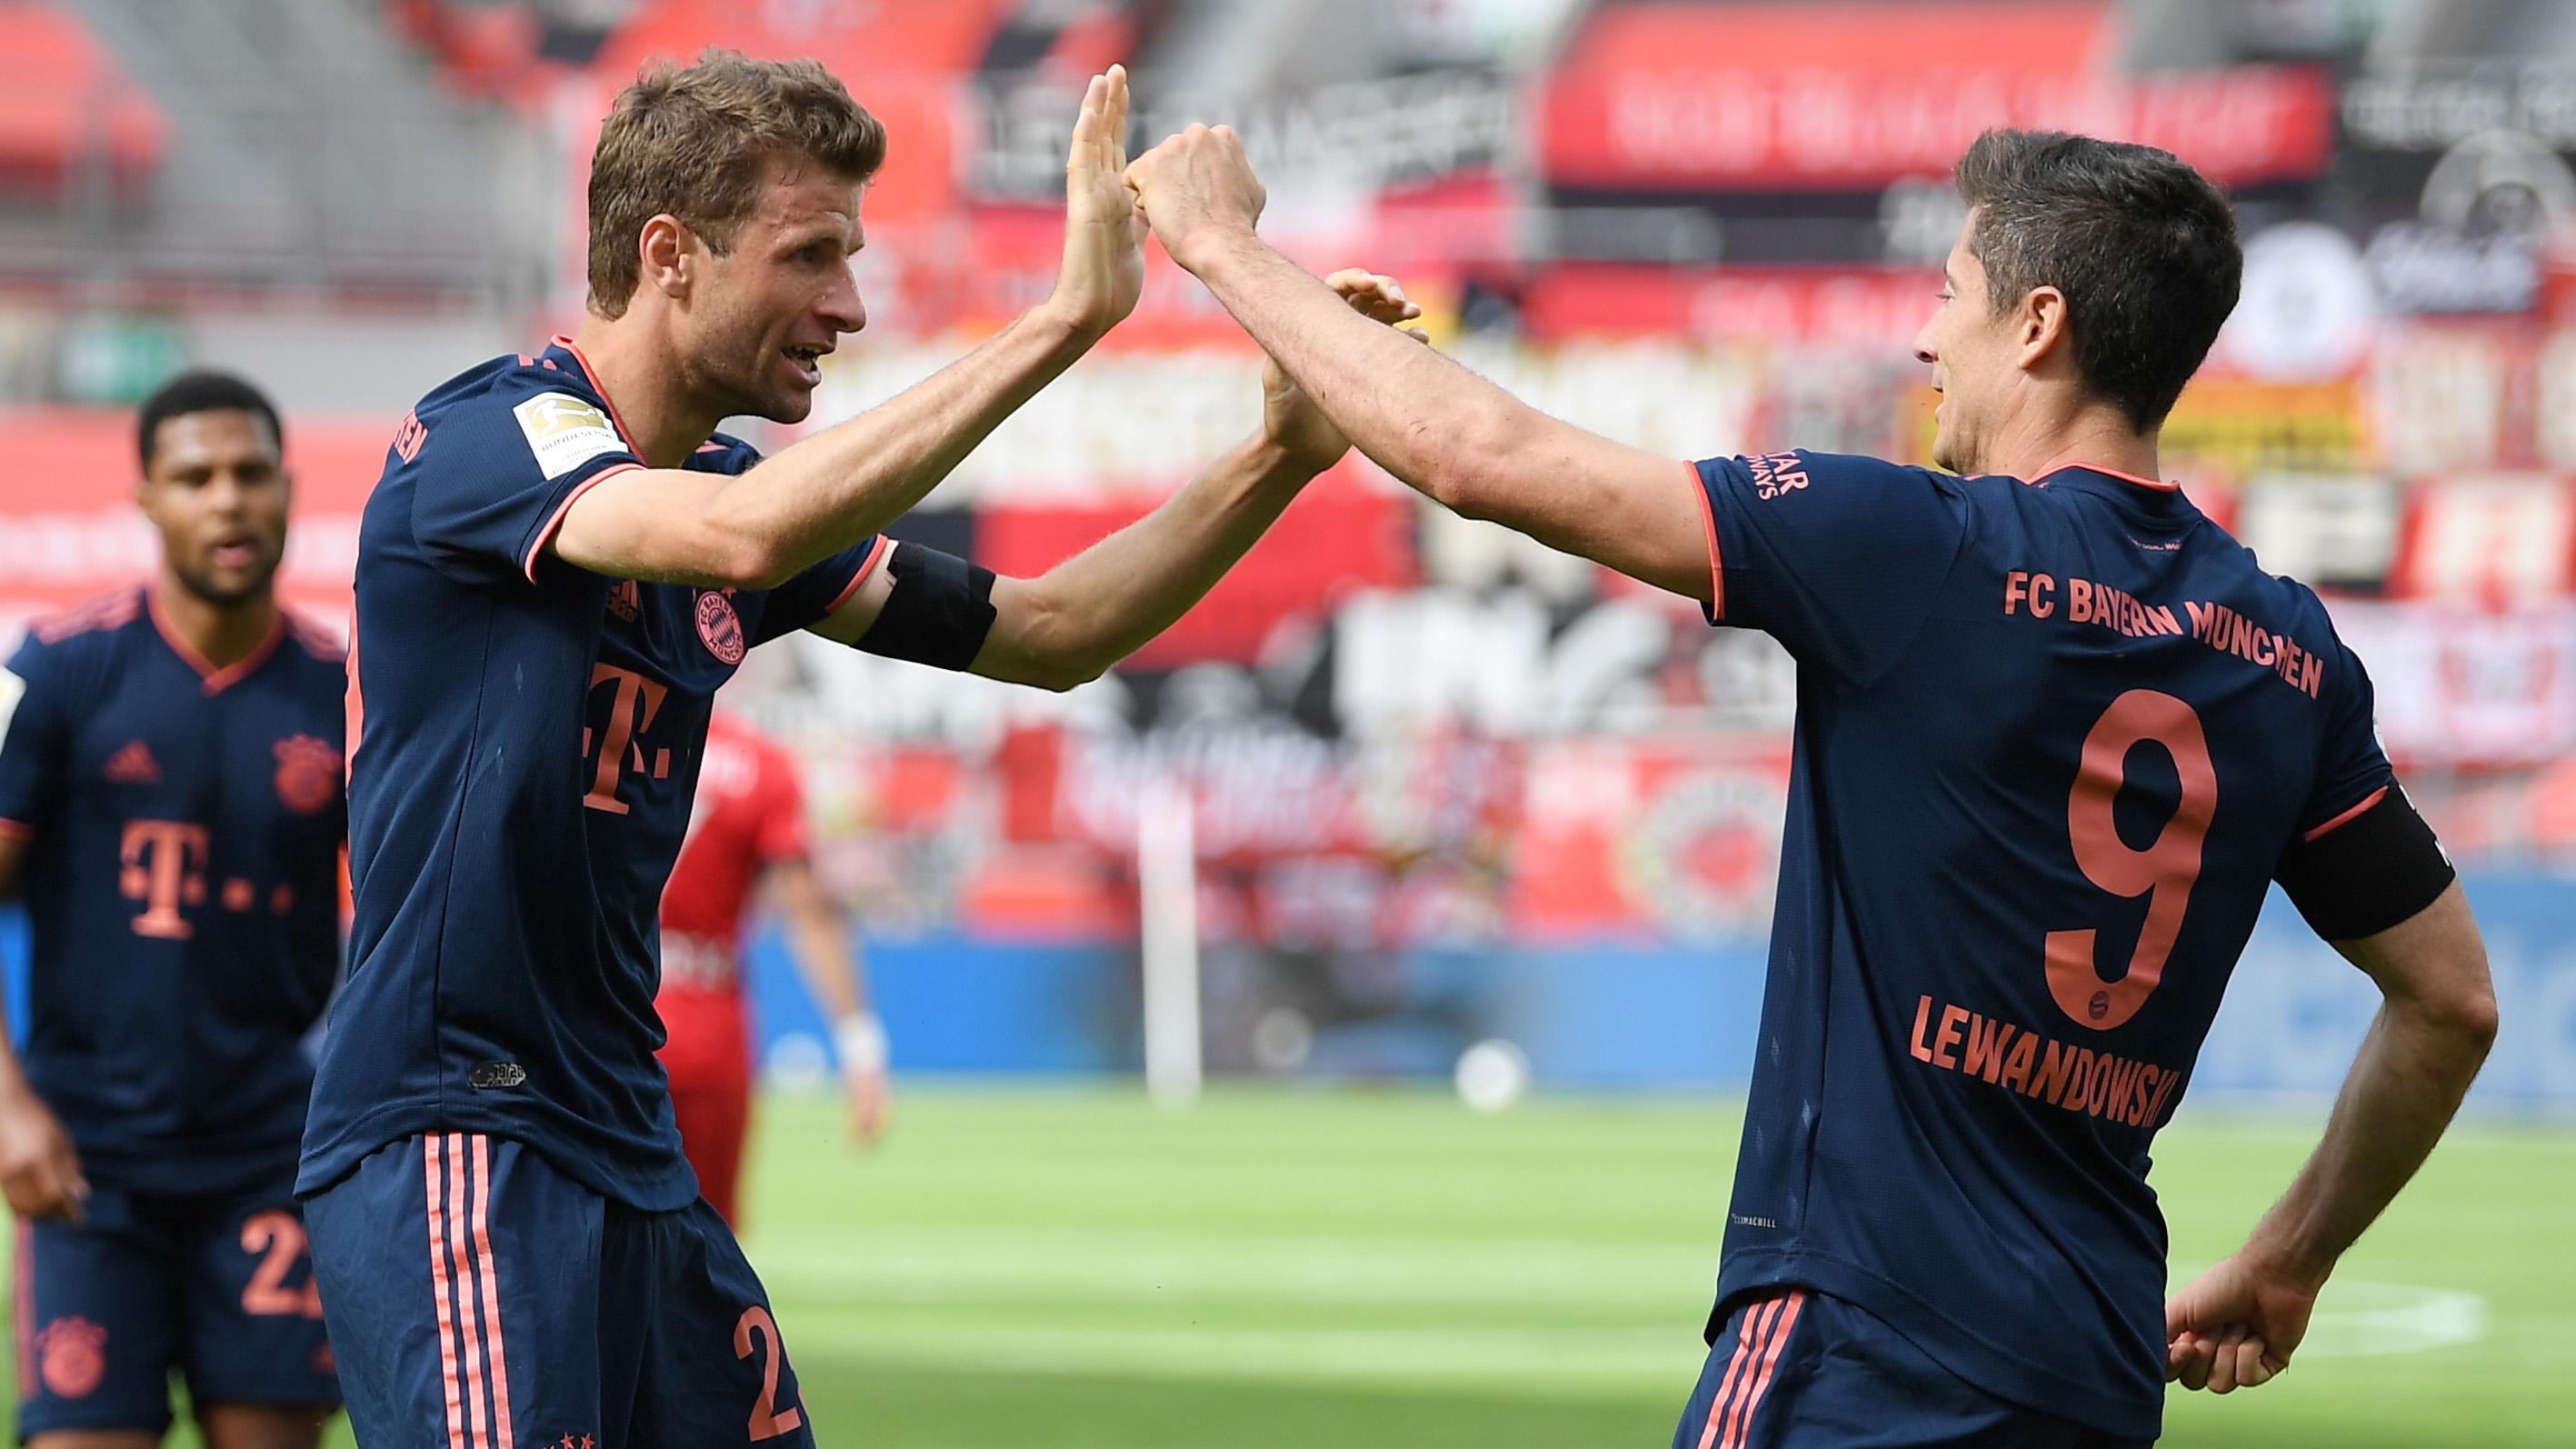 Lewandowski hits personal best with 44th goal as Bayern Munich team-mate Muller matches De Bruyne record